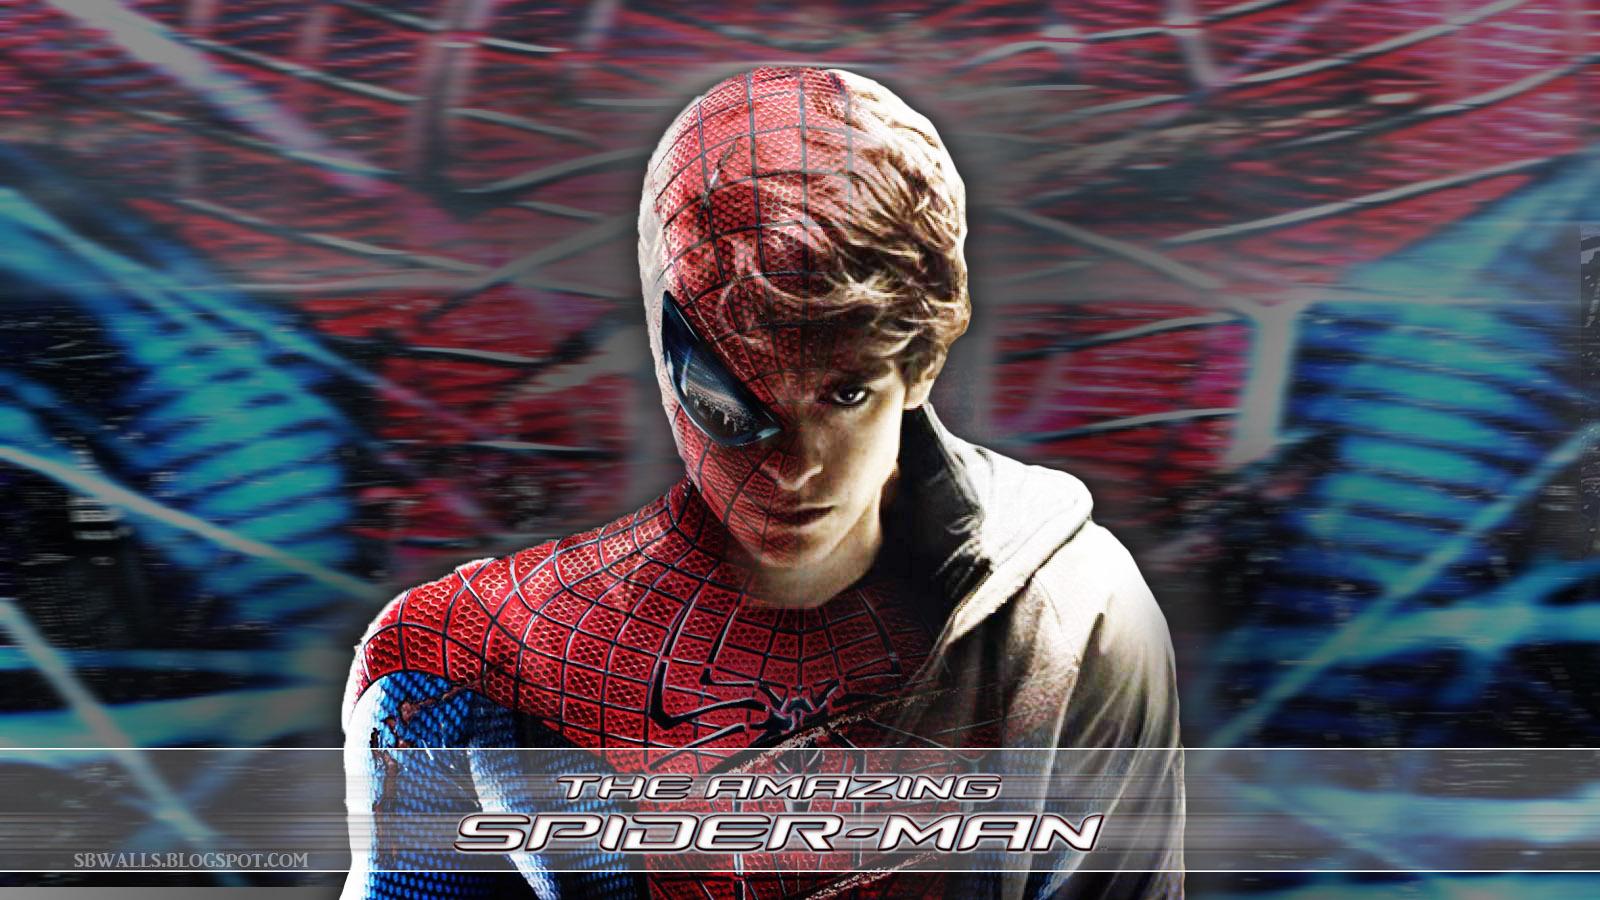 Spiderman-Wallpaper-the-amazing-spider-man-2012-31480798-1600-900